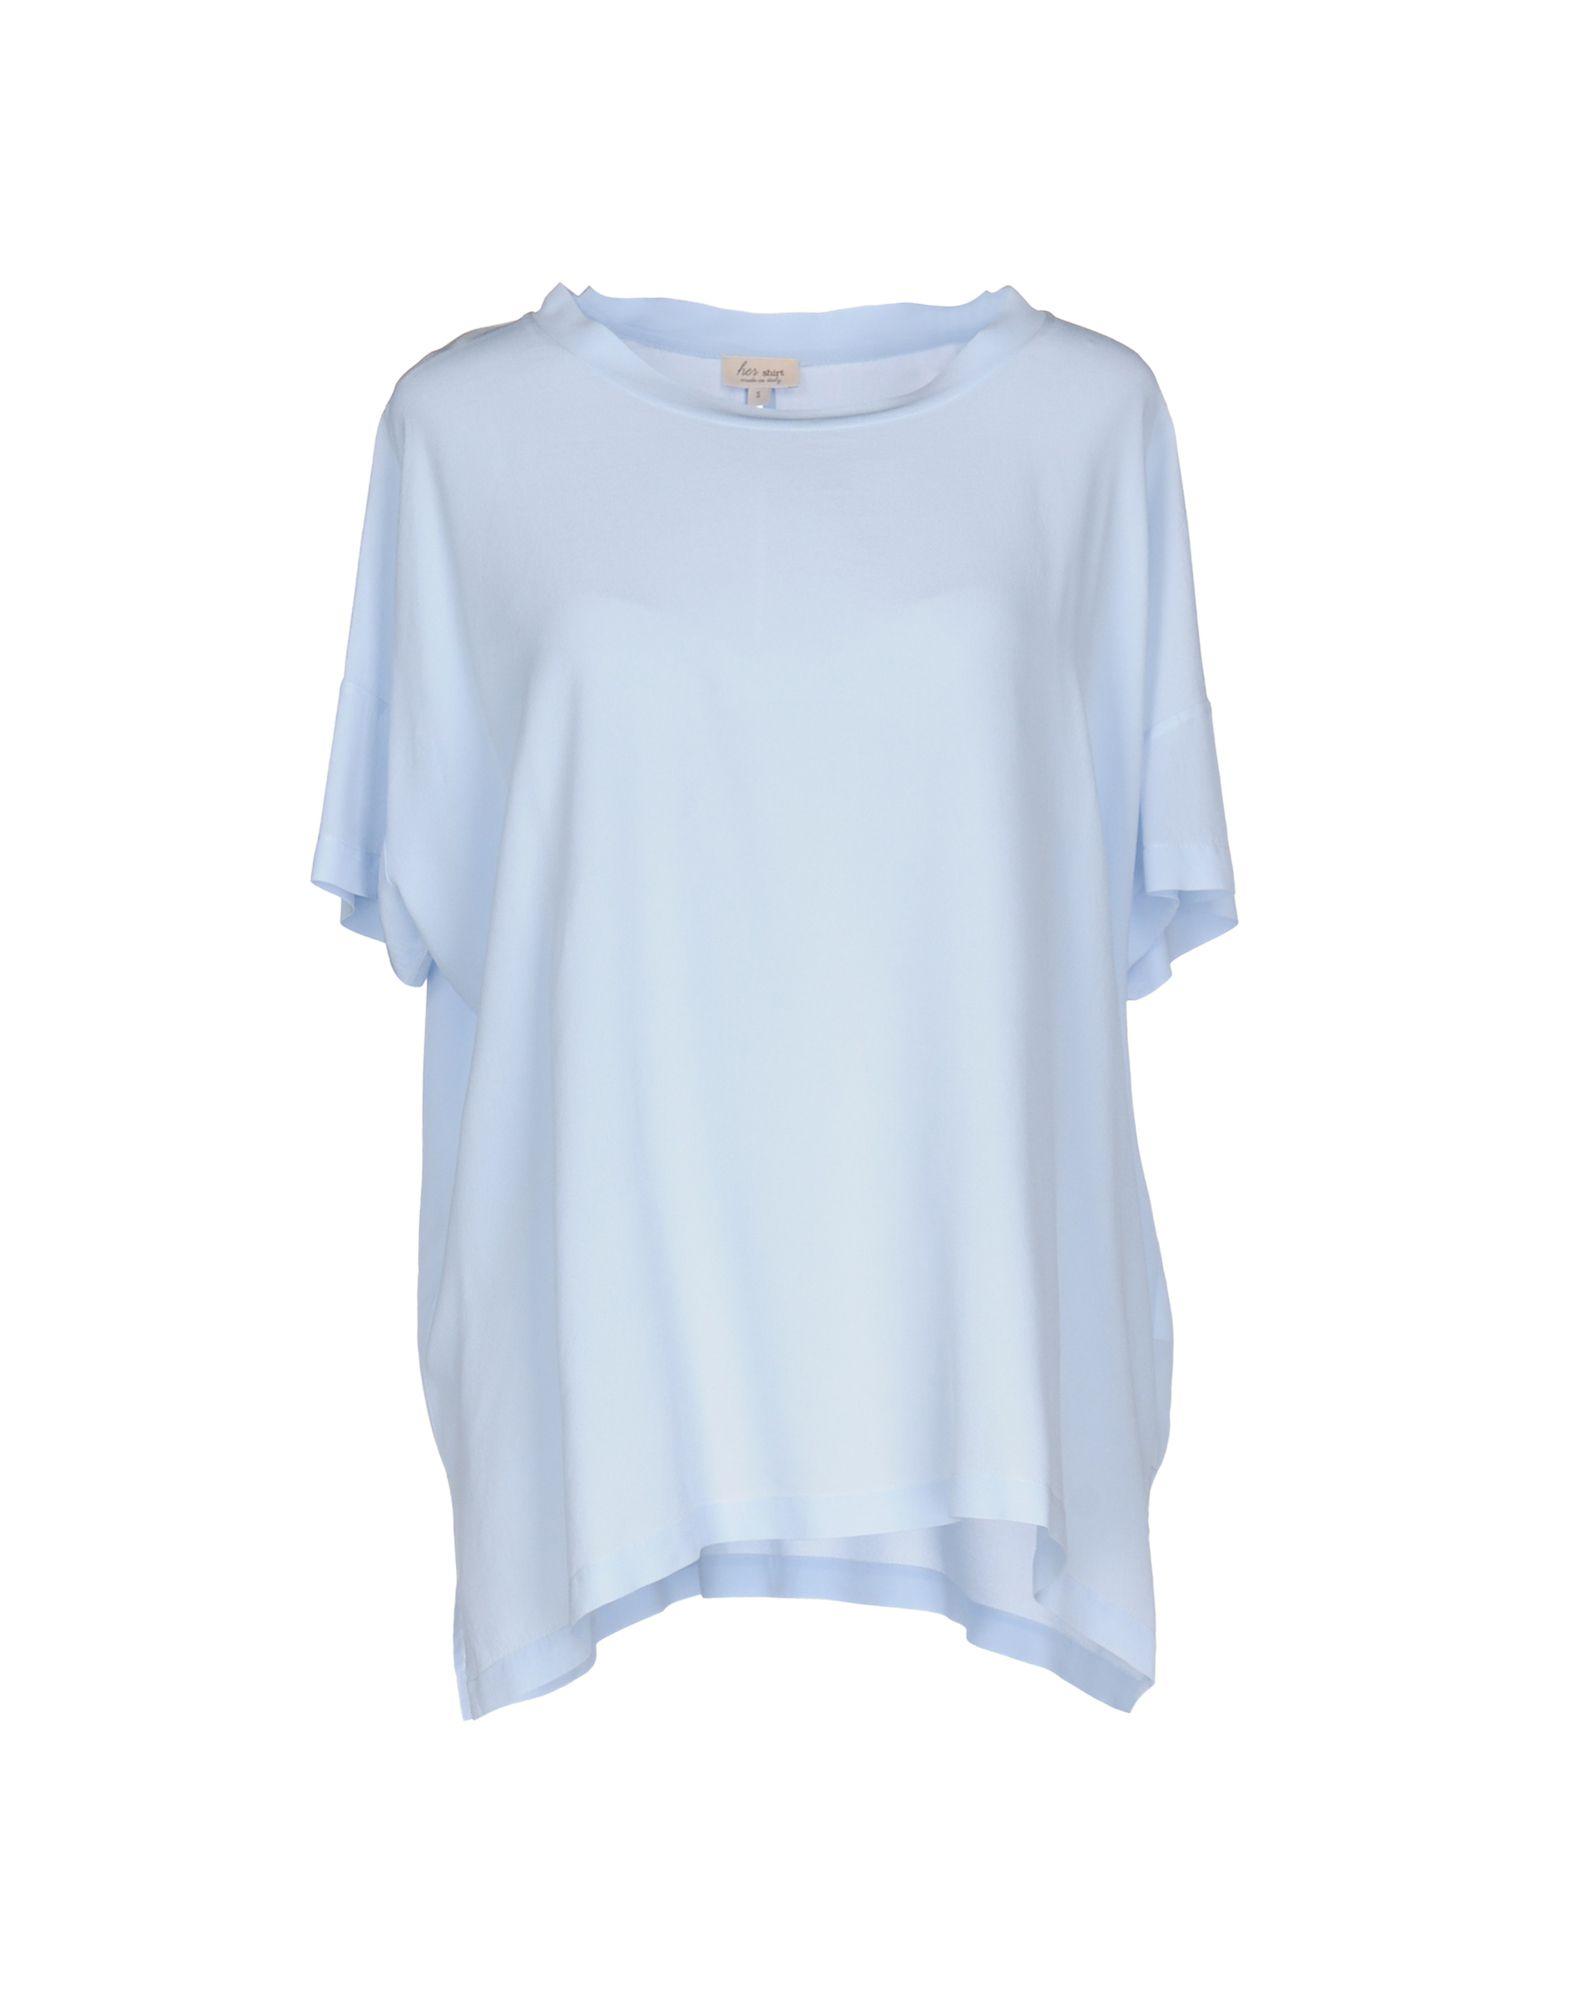 HER SHIRT Damen Bluse Farbe Himmelblau Größe 4